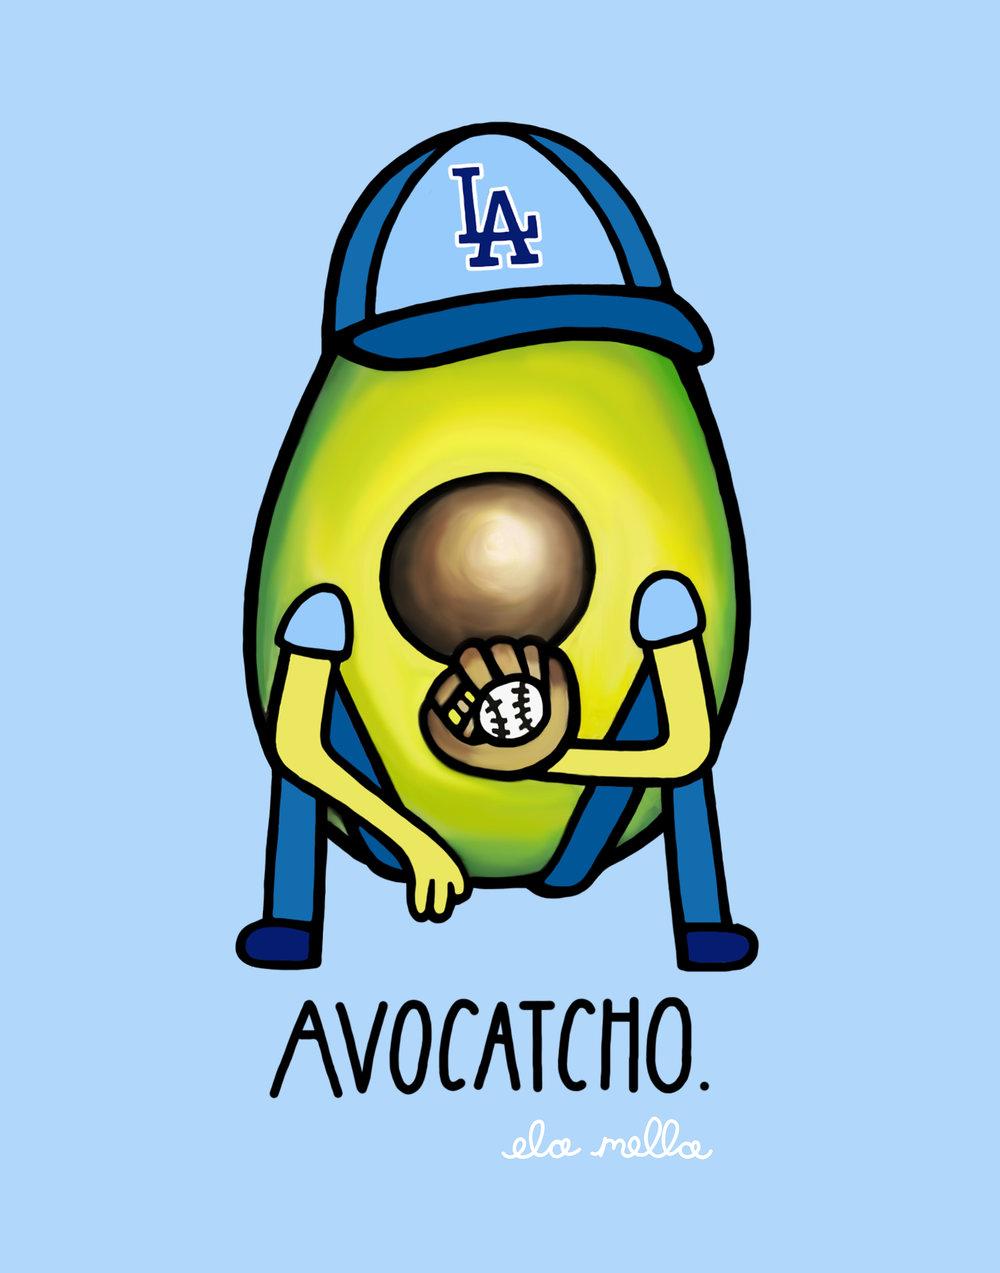 Avocatcho Dodgers 5x7.jpg